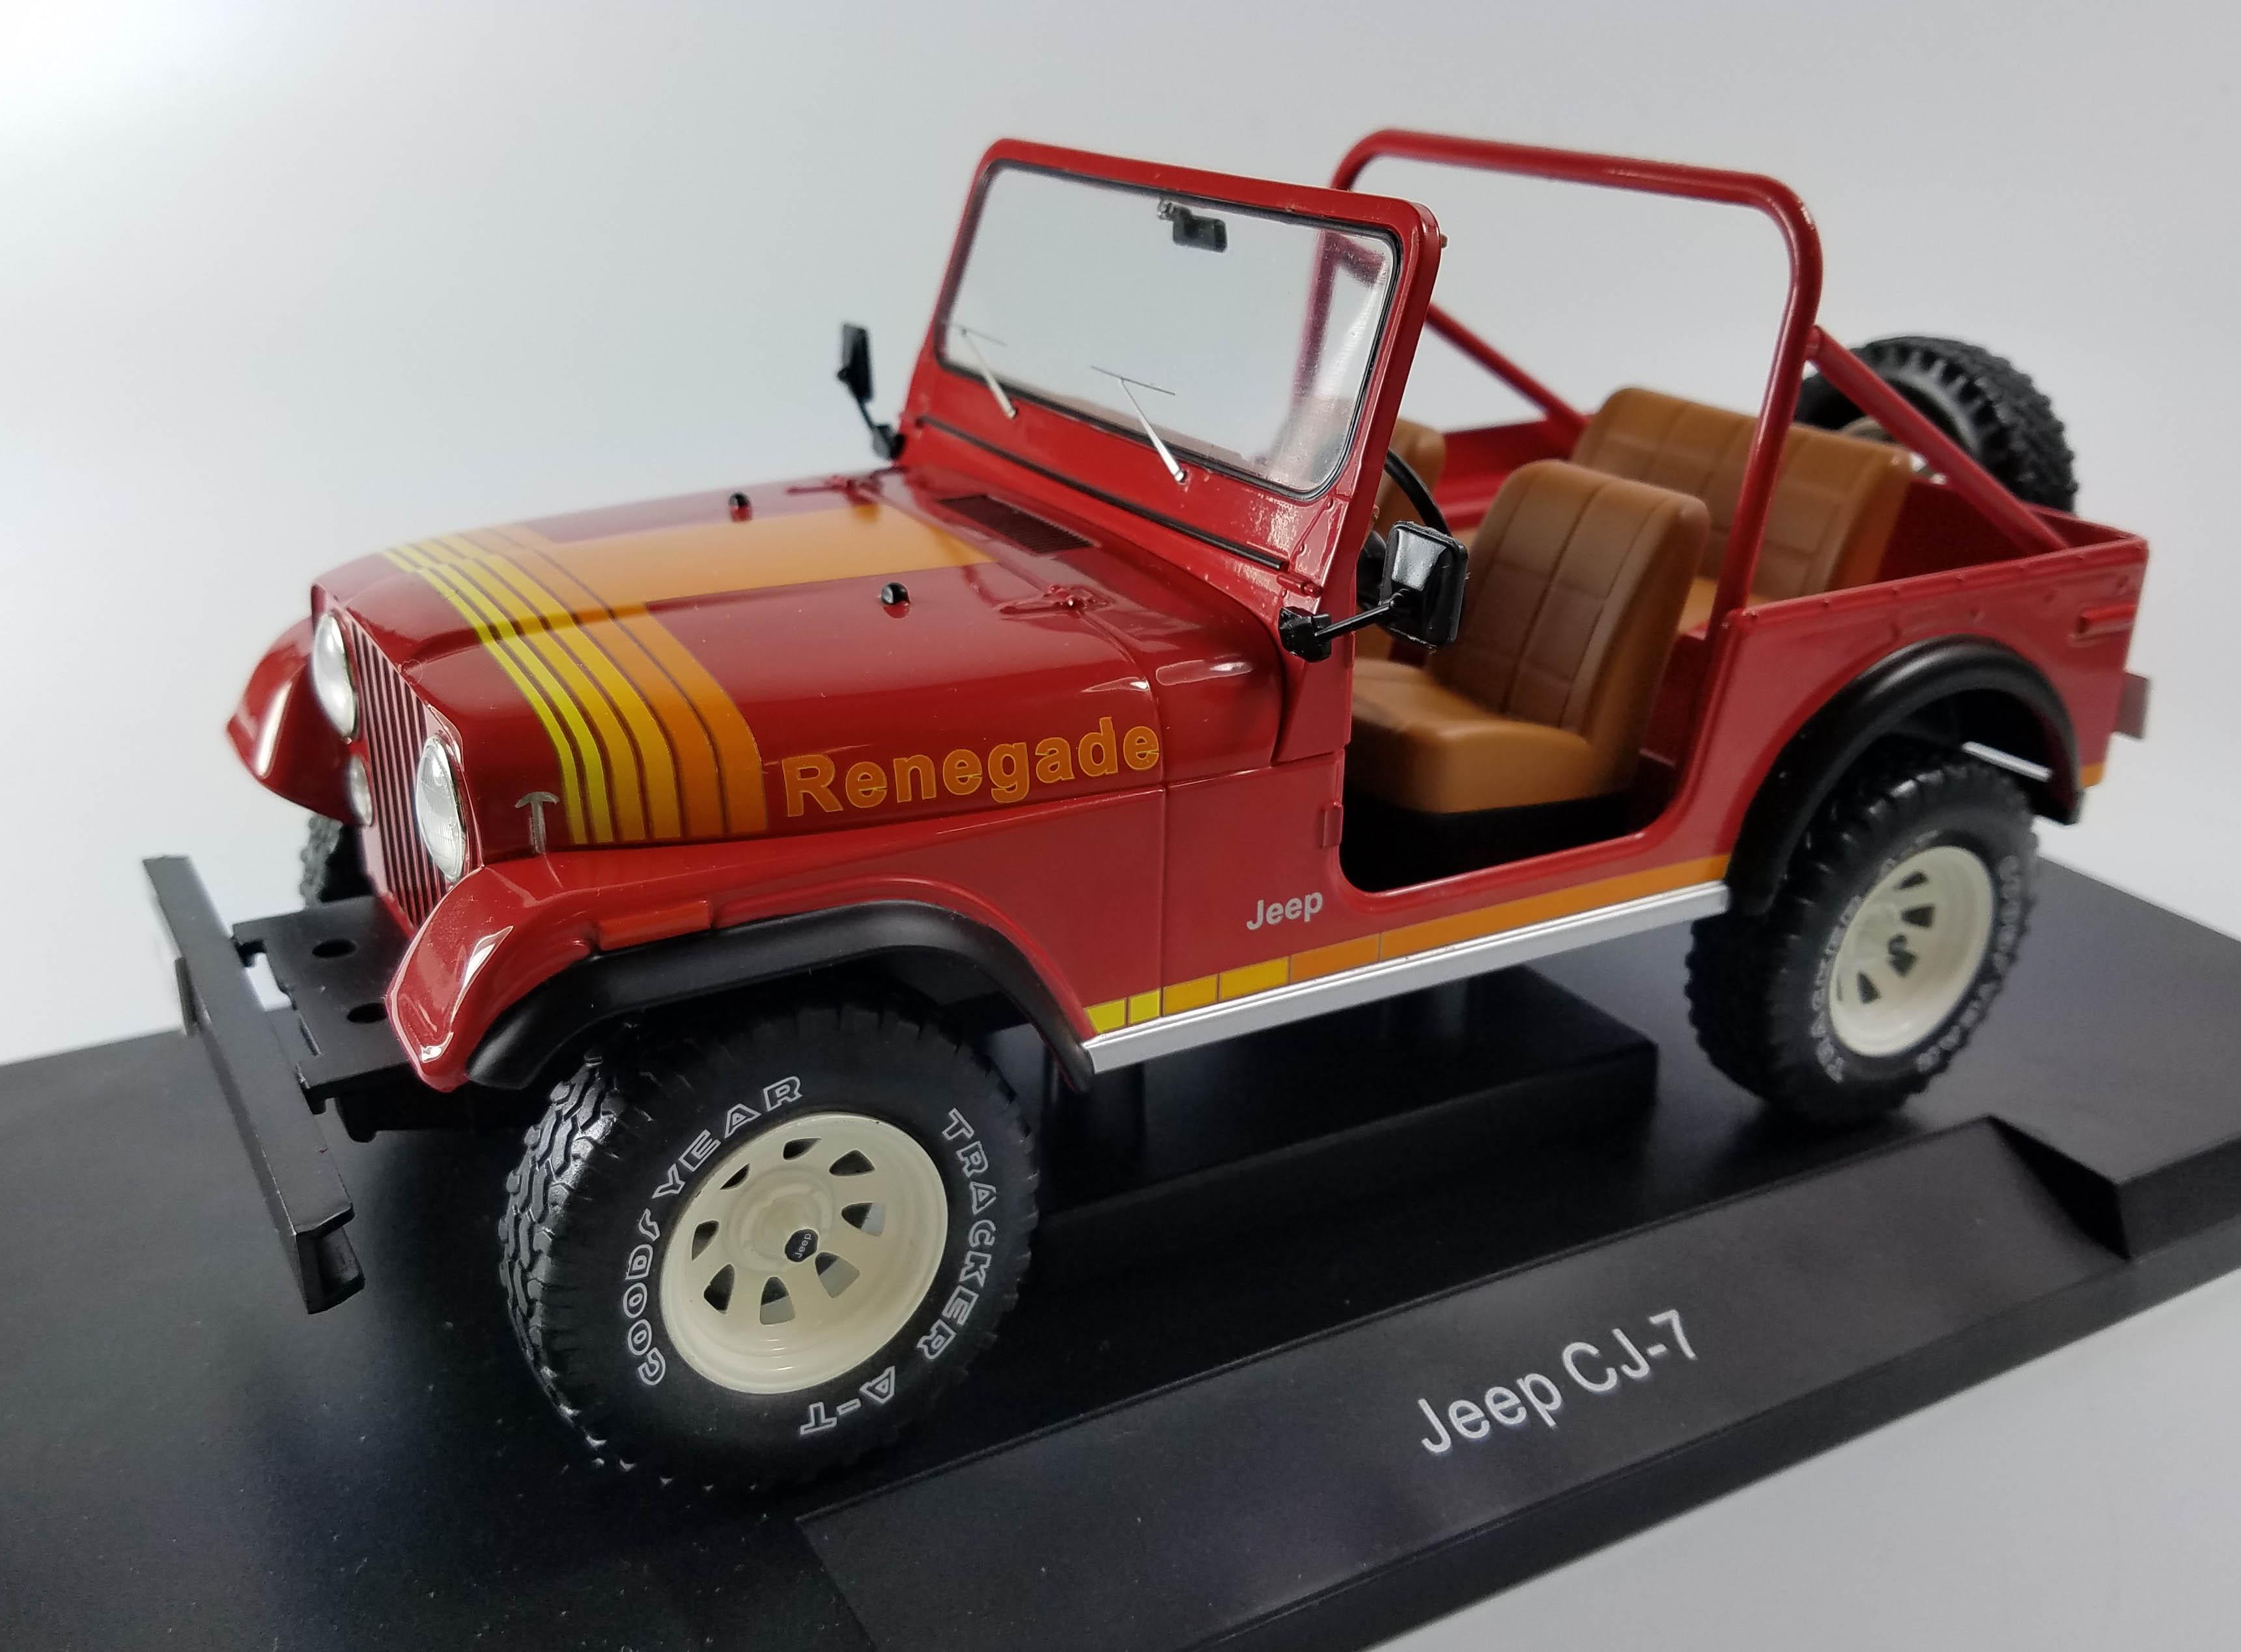 1:18 Model car group jeep cj-7 Renegade 1976 red